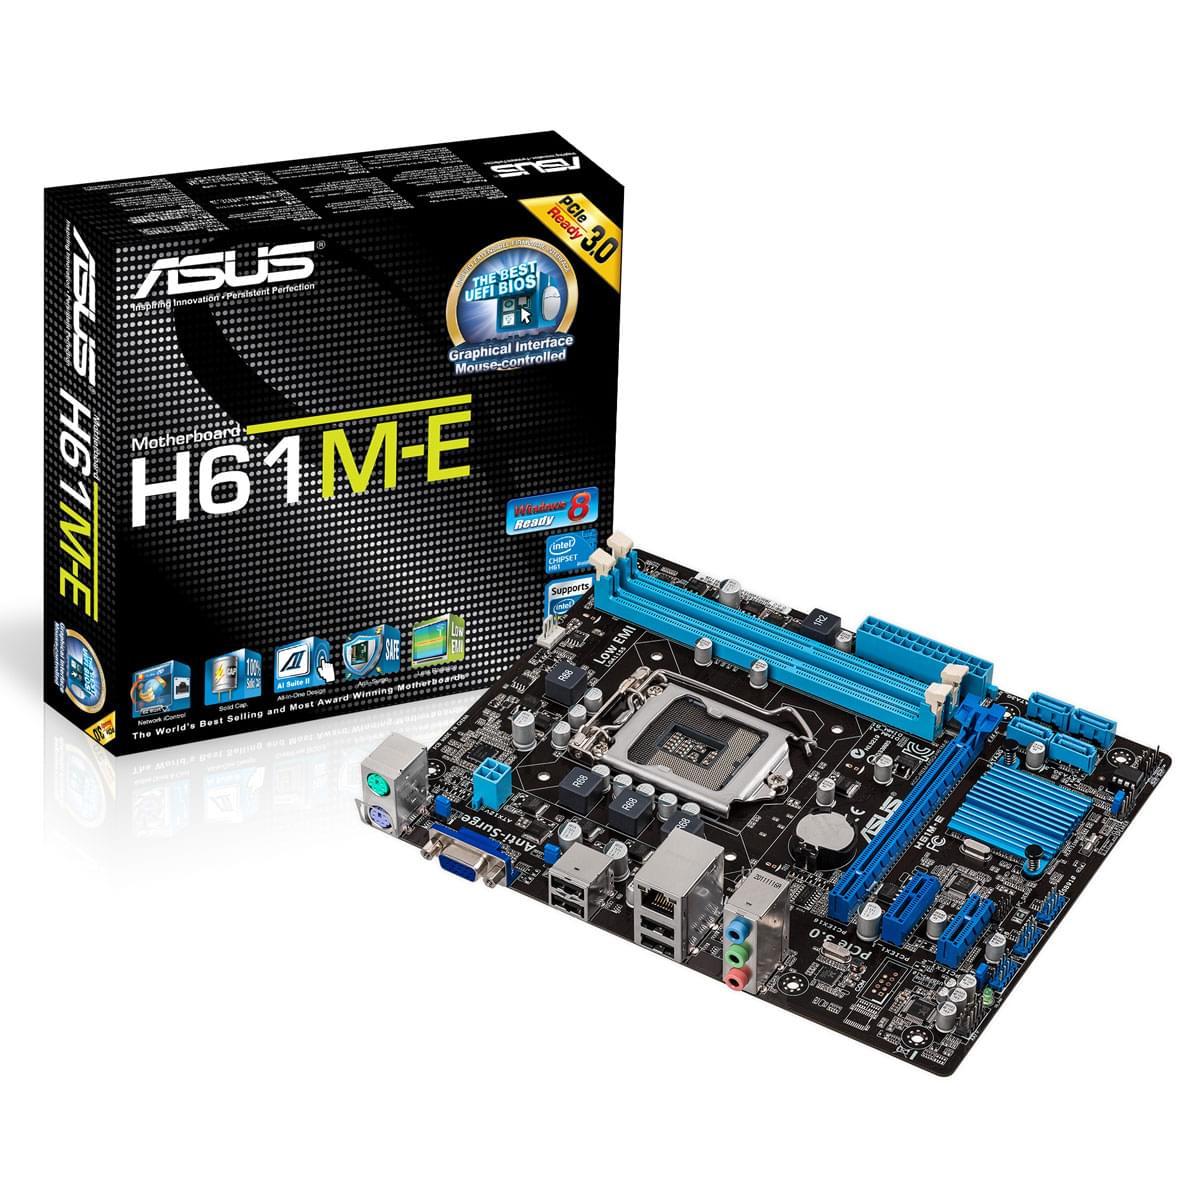 Asus H61M-E Micro-ATX DDR3 - Carte mère Asus - Cybertek.fr - 0